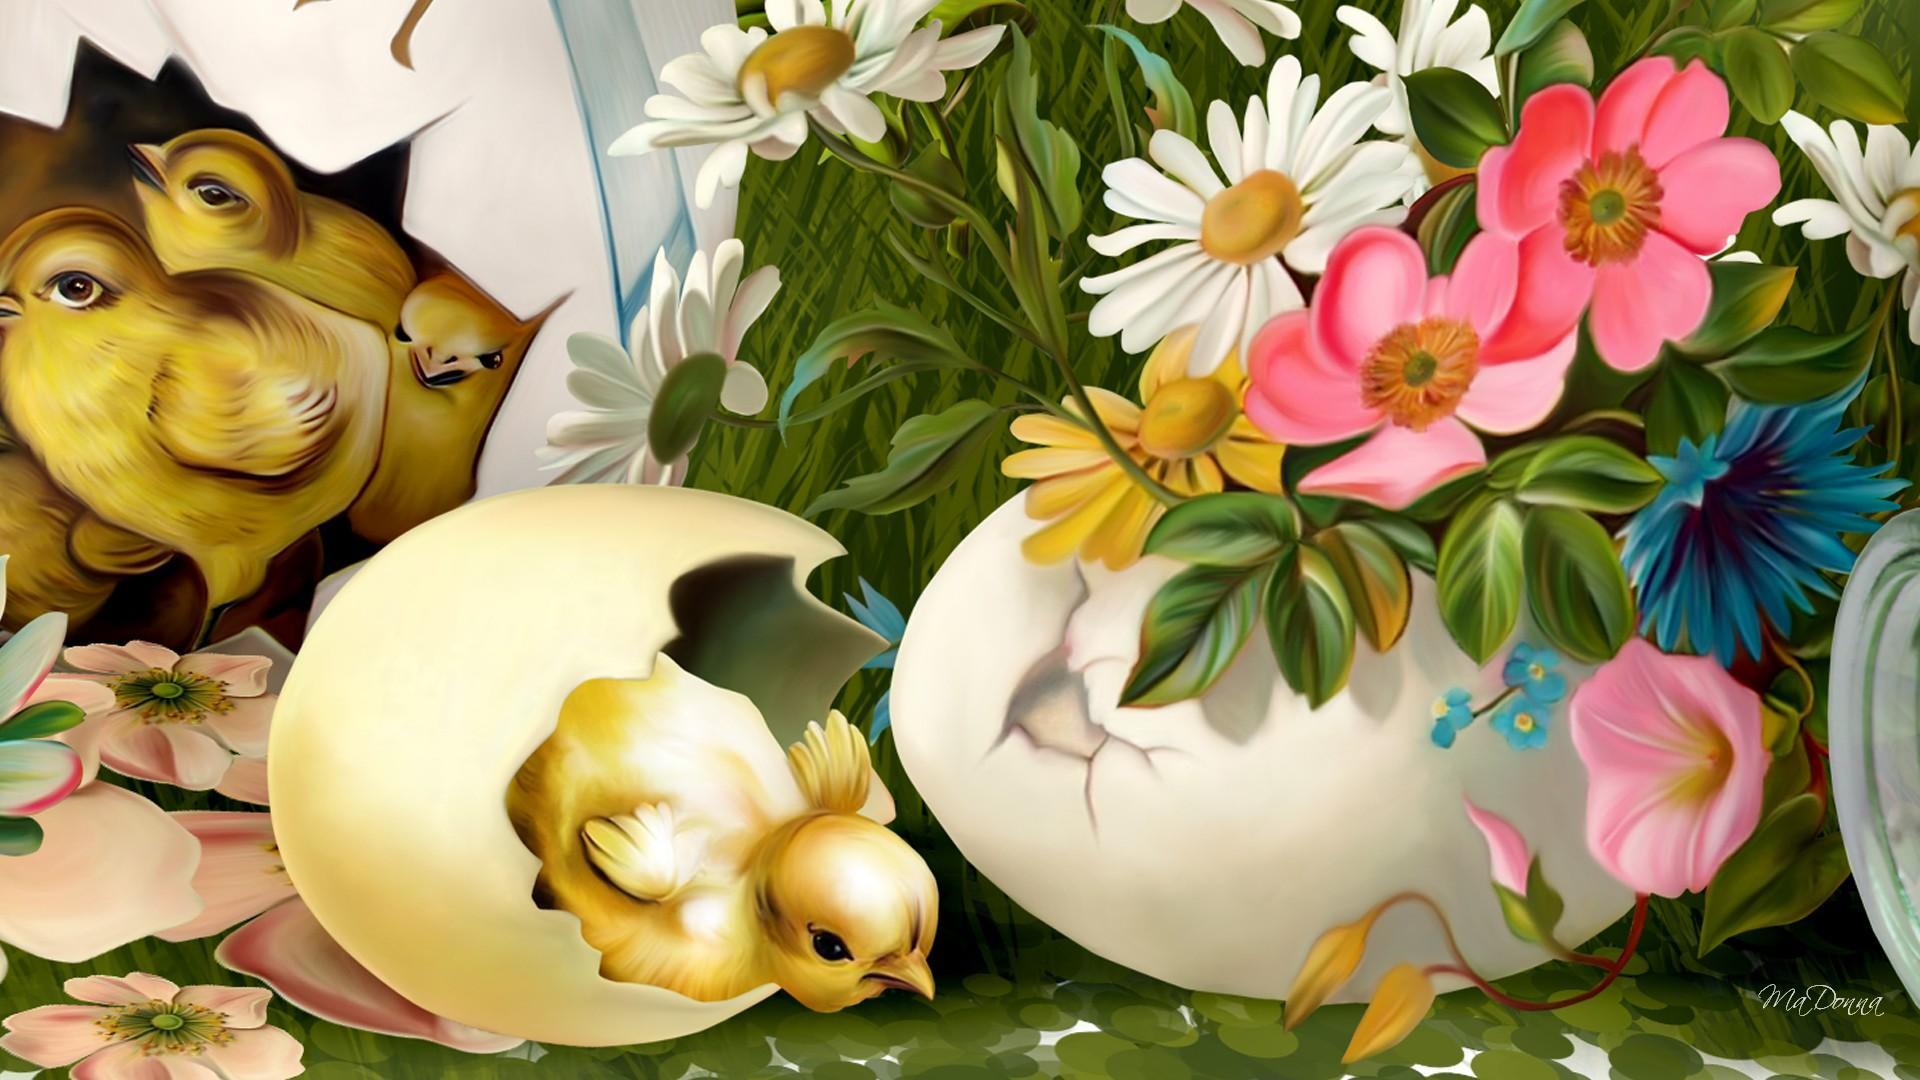 Easter Happening Painting Hd Wallpaper Wallpaper List 1920x1080